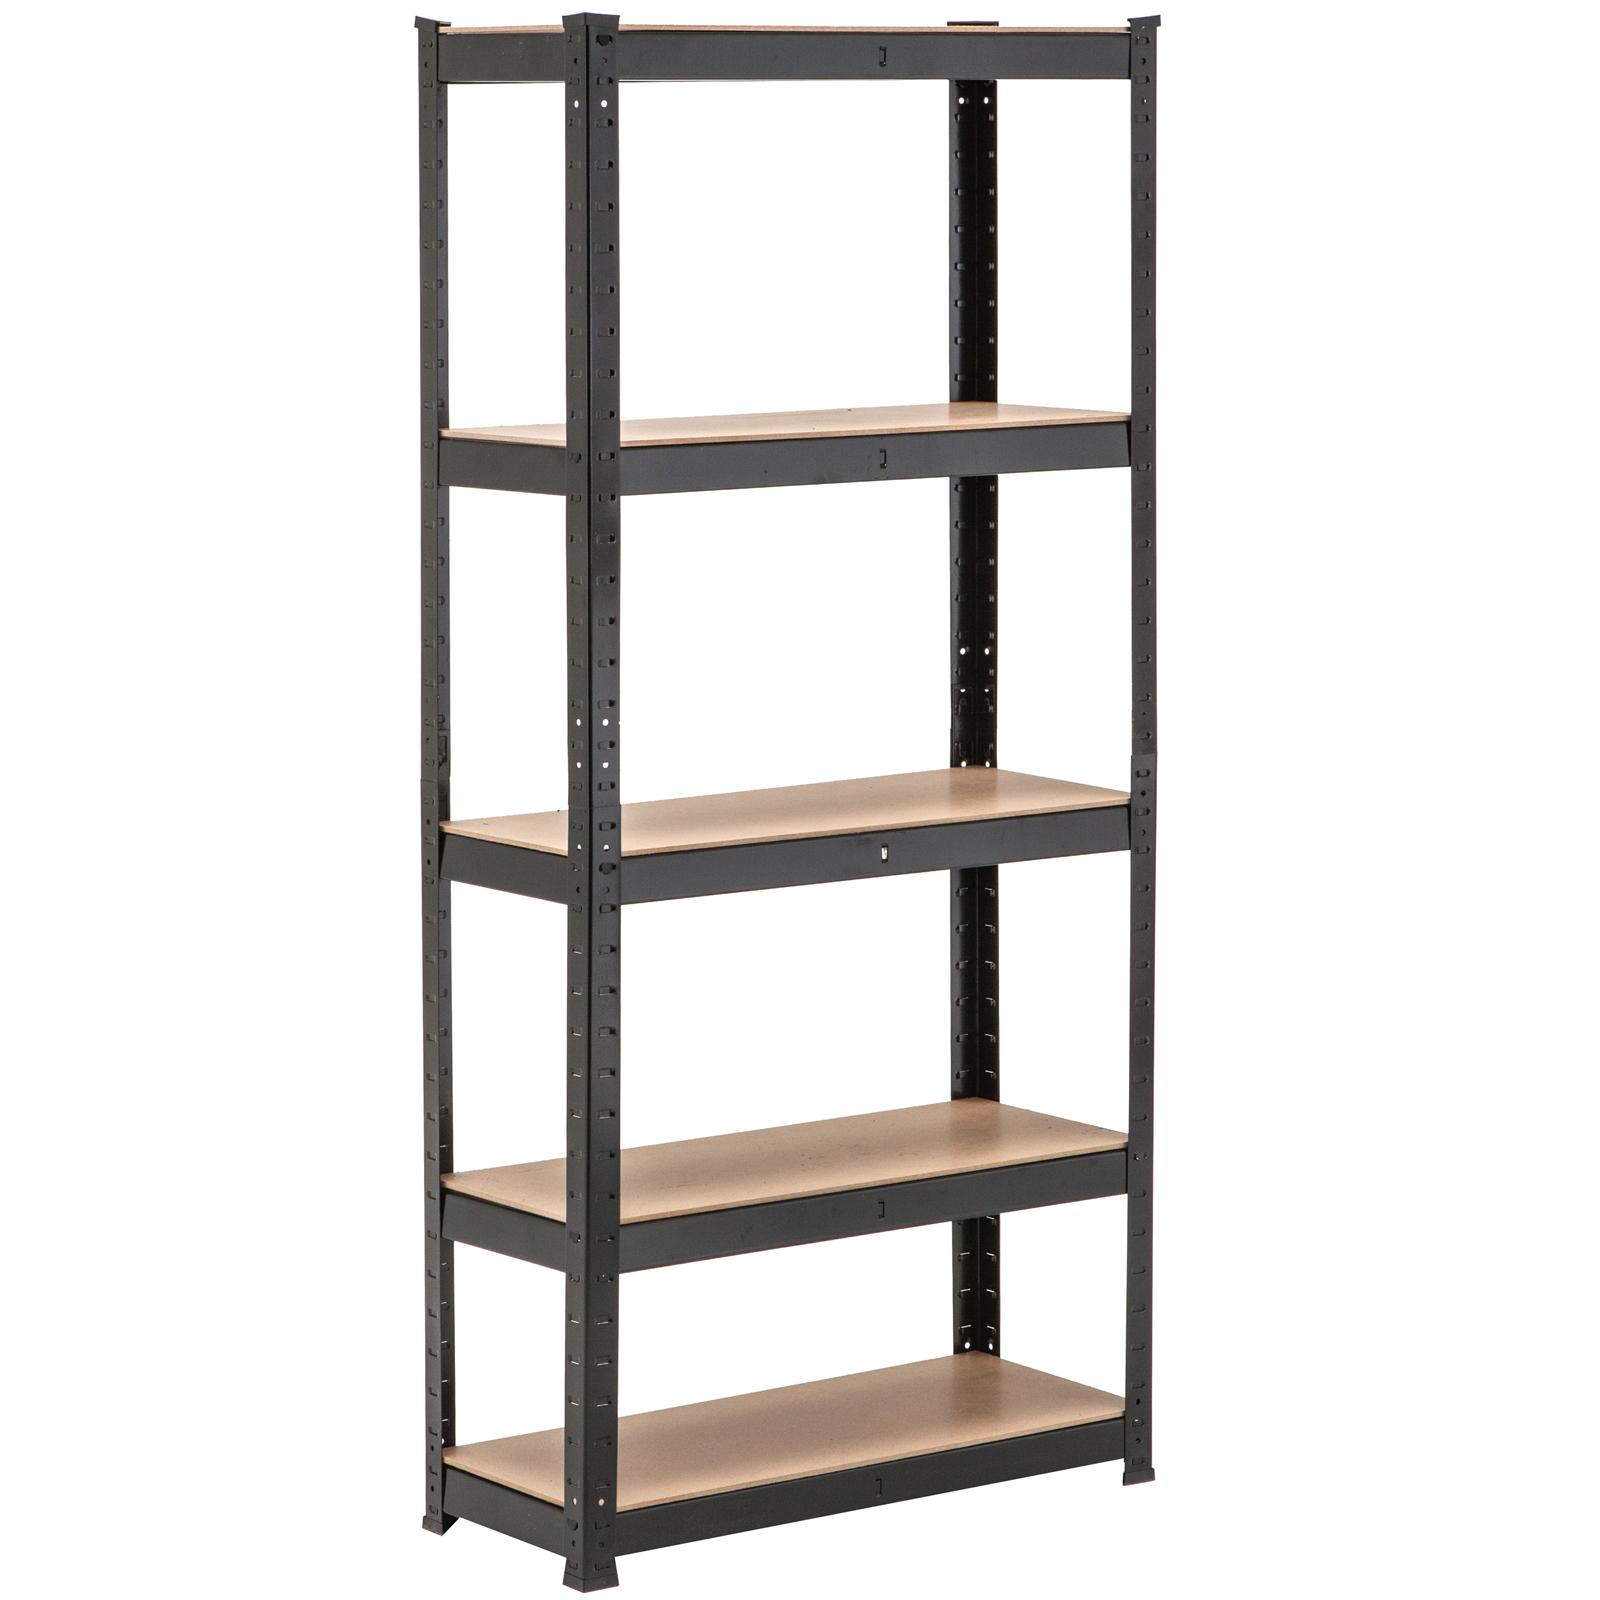 5 tier heavy duty boltless metal black shelving storage. Black Bedroom Furniture Sets. Home Design Ideas